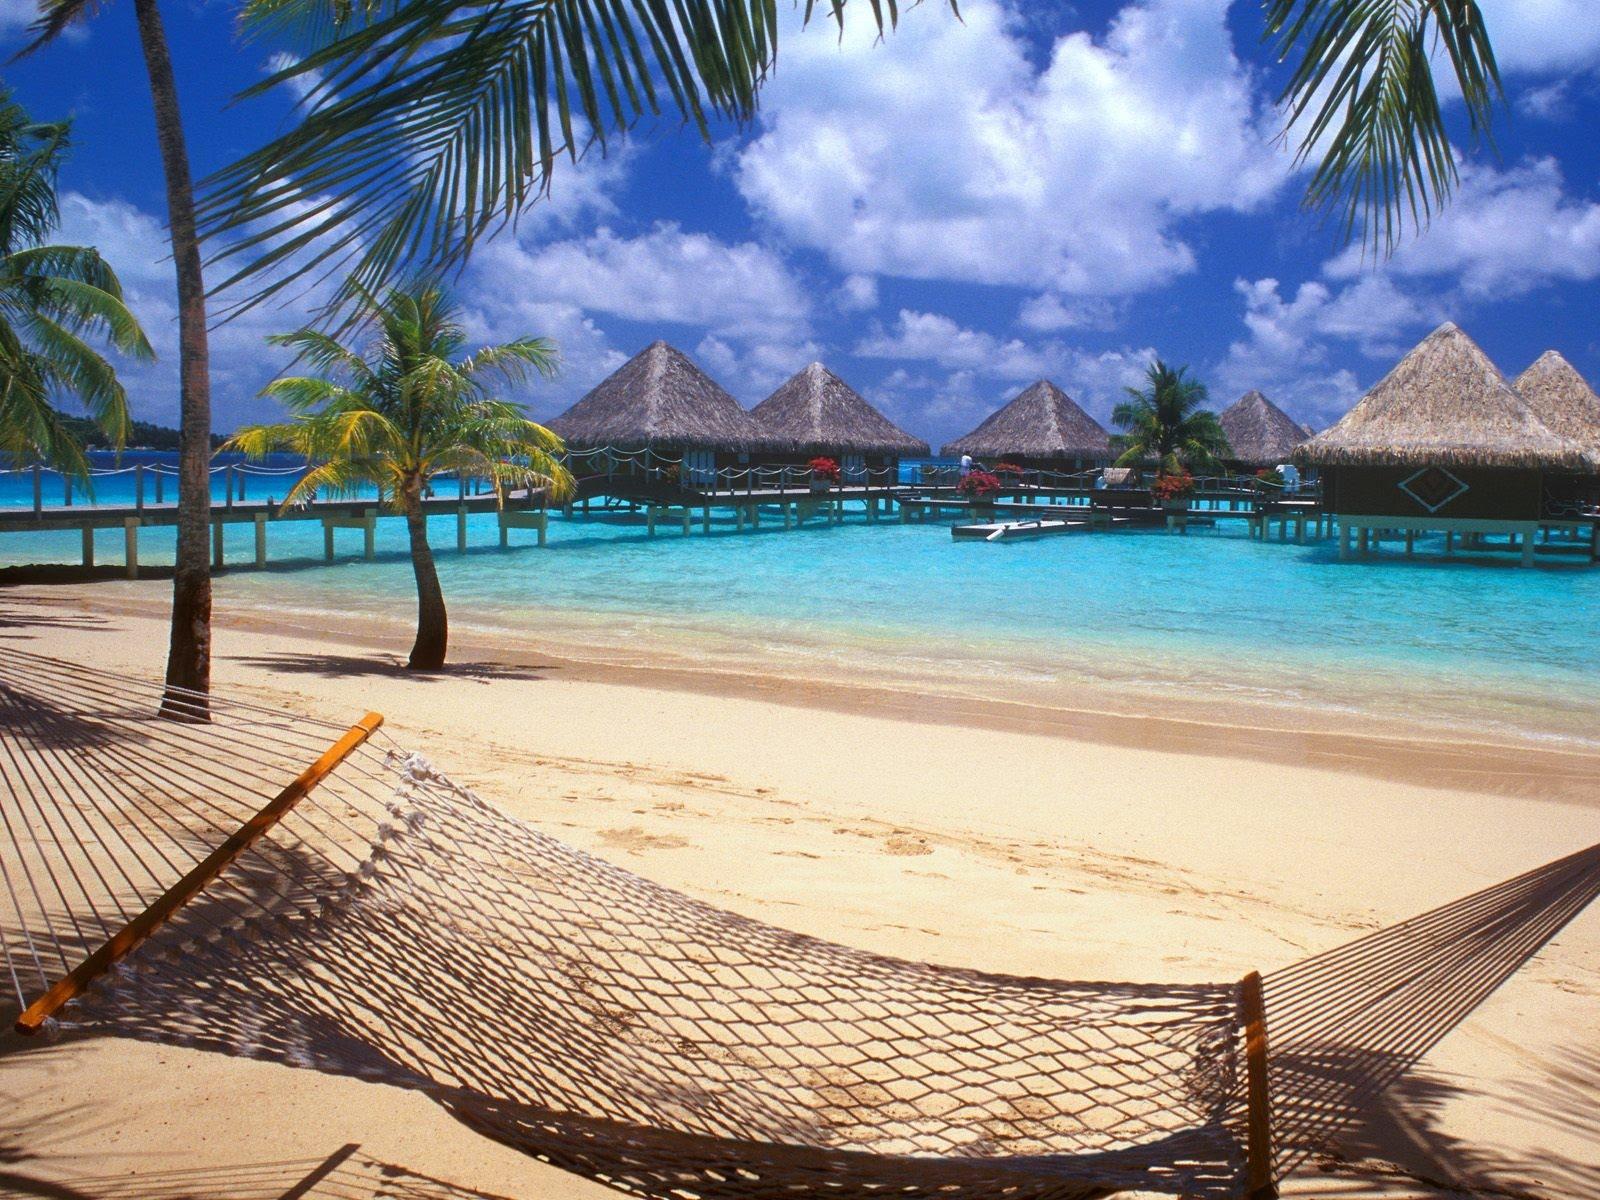 Bora Bora -Travel Wallpapers